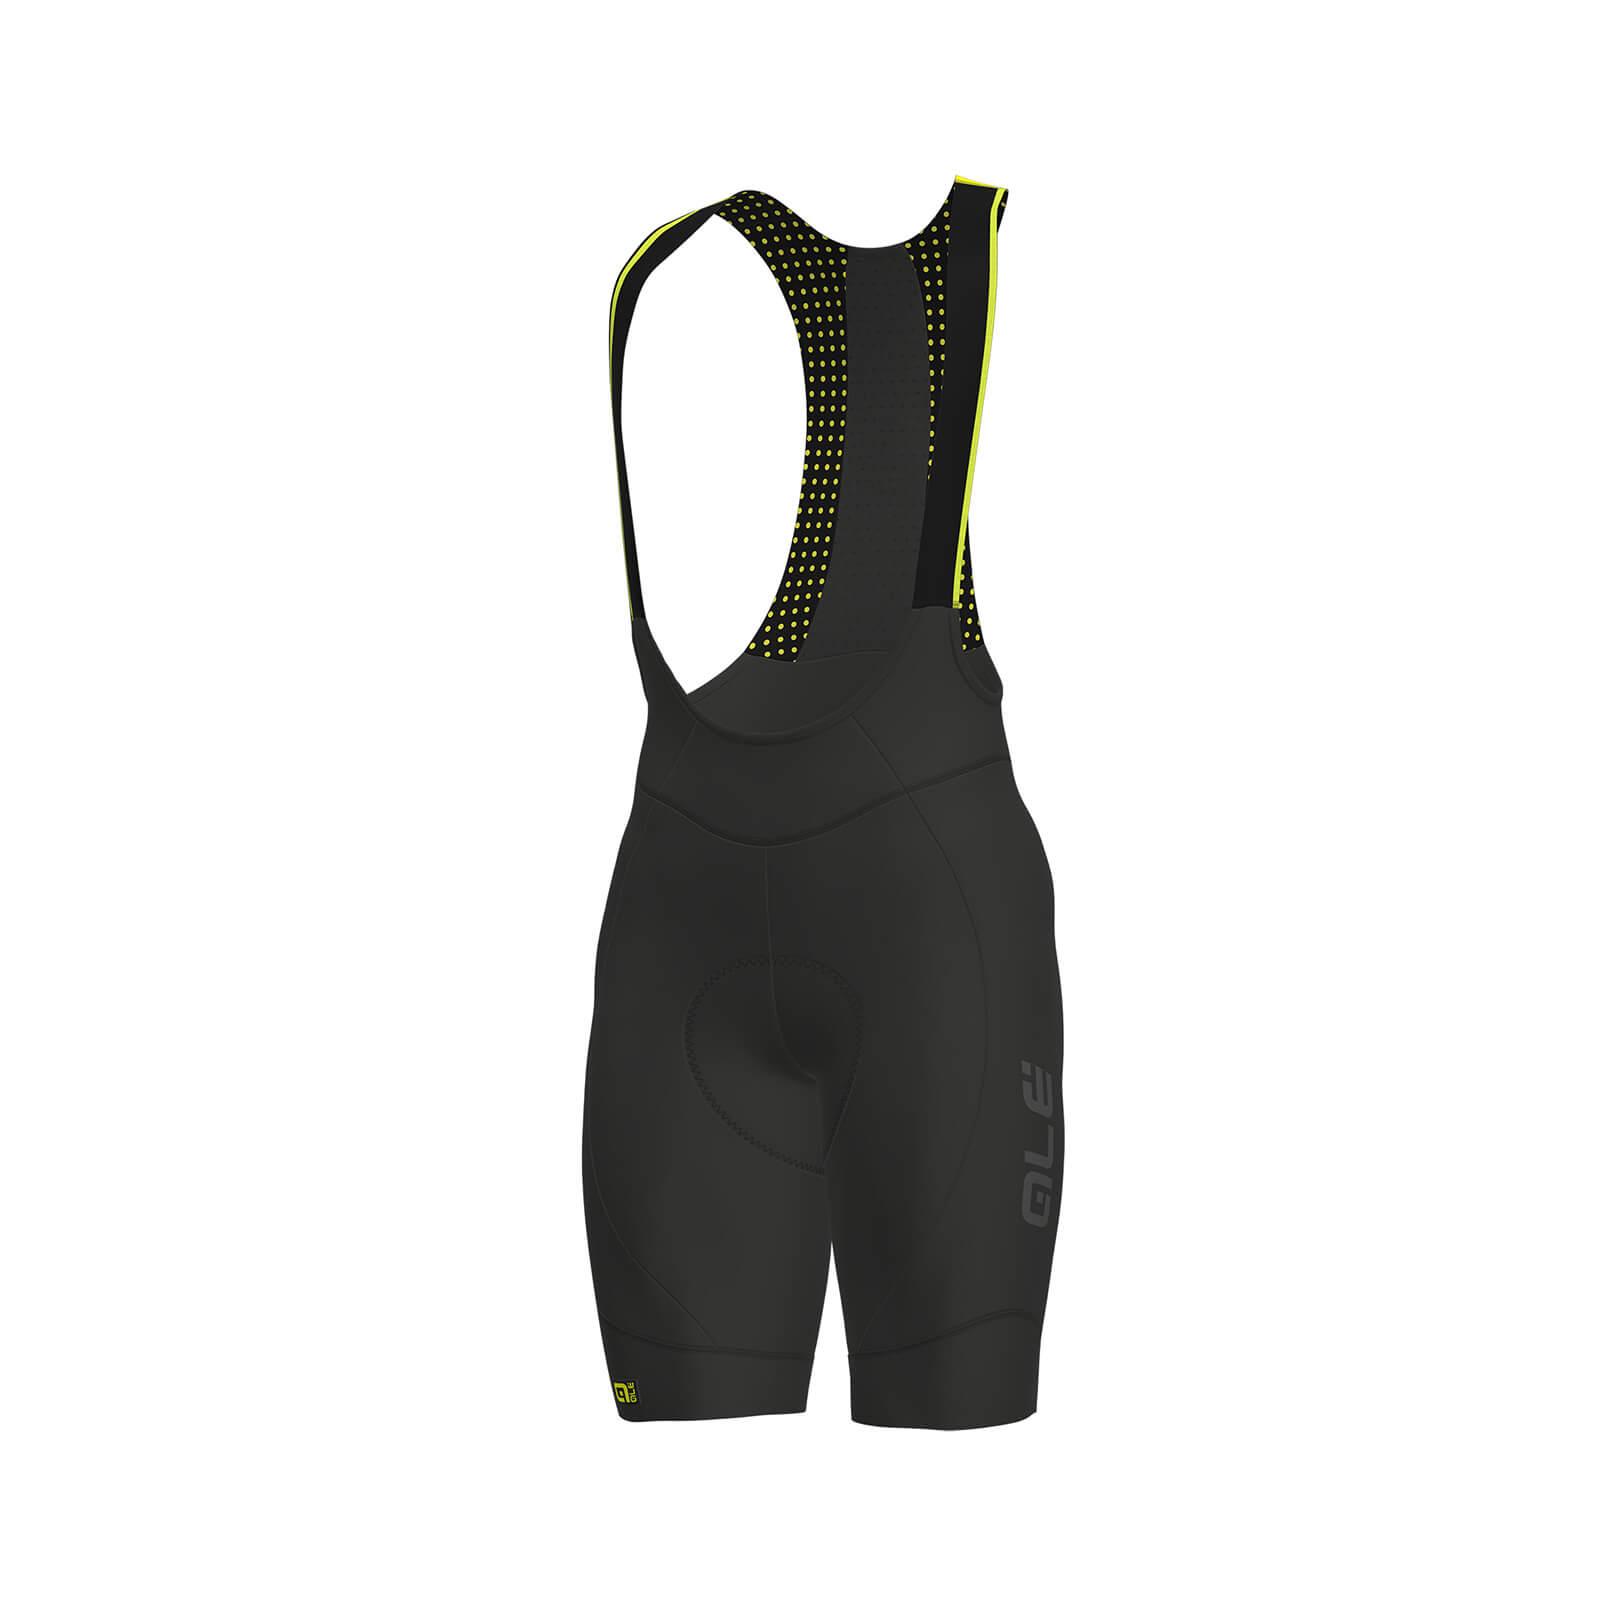 Alé Clima Winter Bib Shorts - L - Black